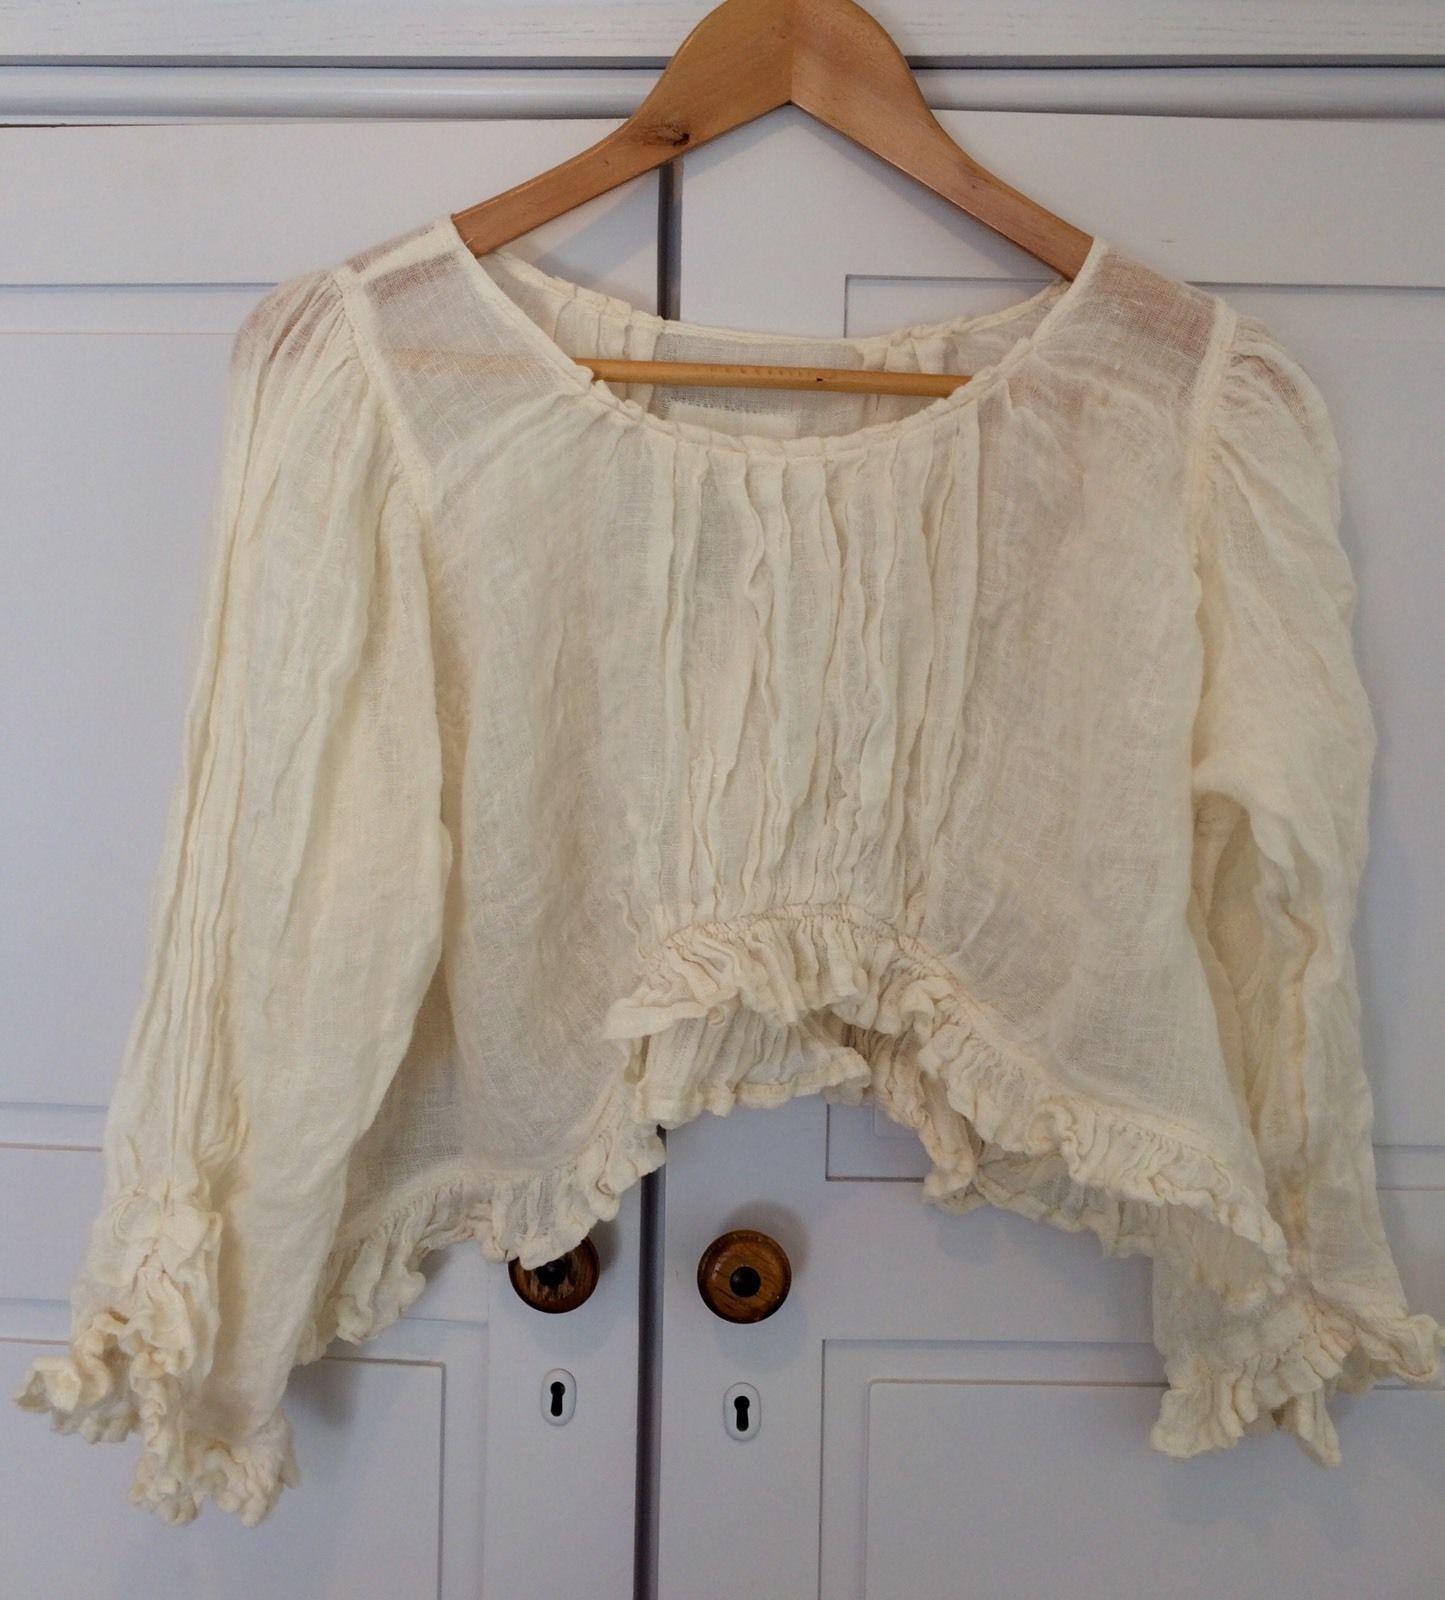 d91ef5af37e Magnolia Pearl Retired Gauze Cream Top | eBay | hypothetical | Cream ...